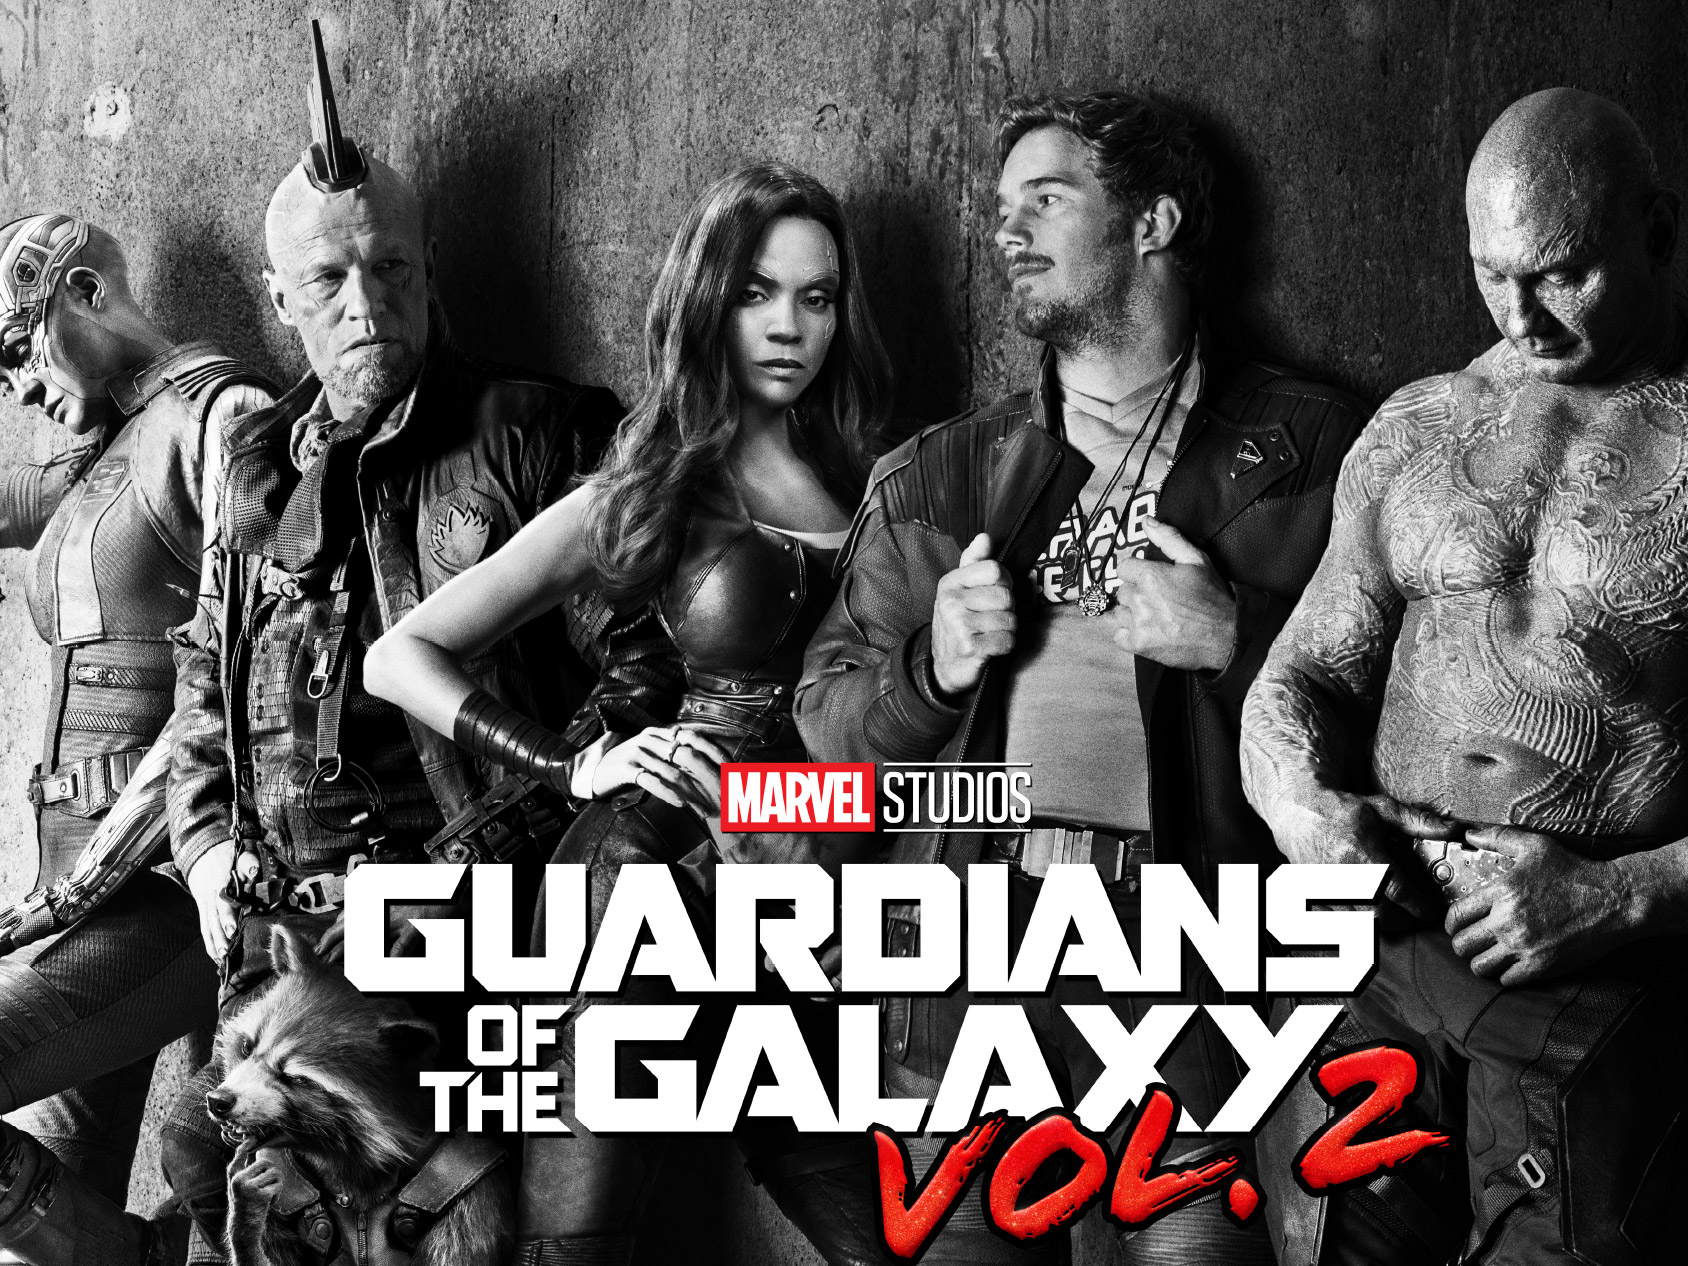 1440x900 2017 Guardians Of The Galaxy Vol 2 1440x900 Resolution Hd